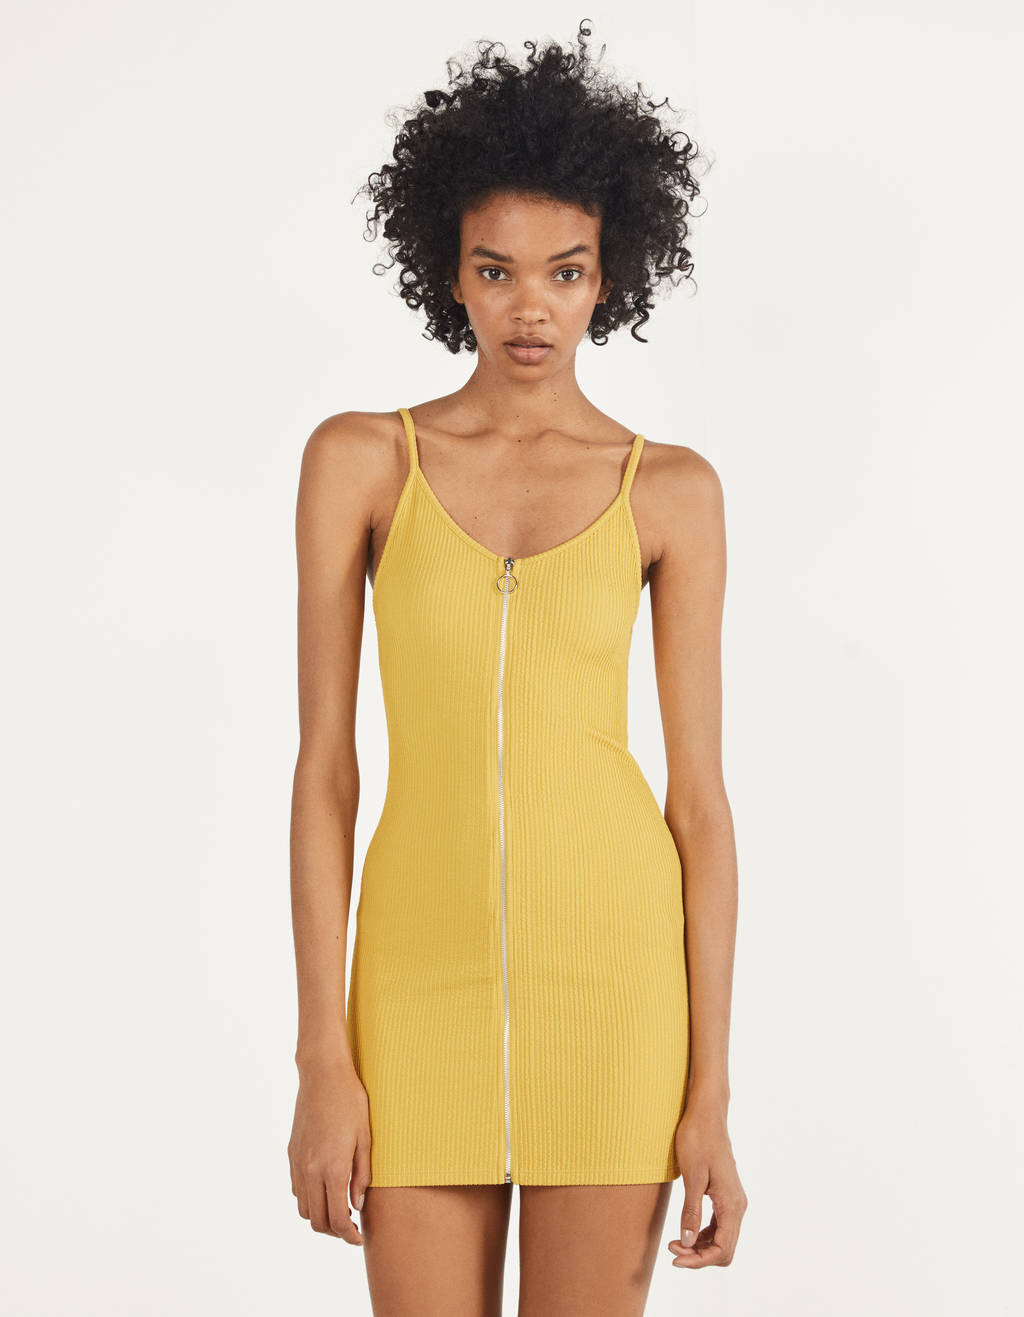 Zipped dress